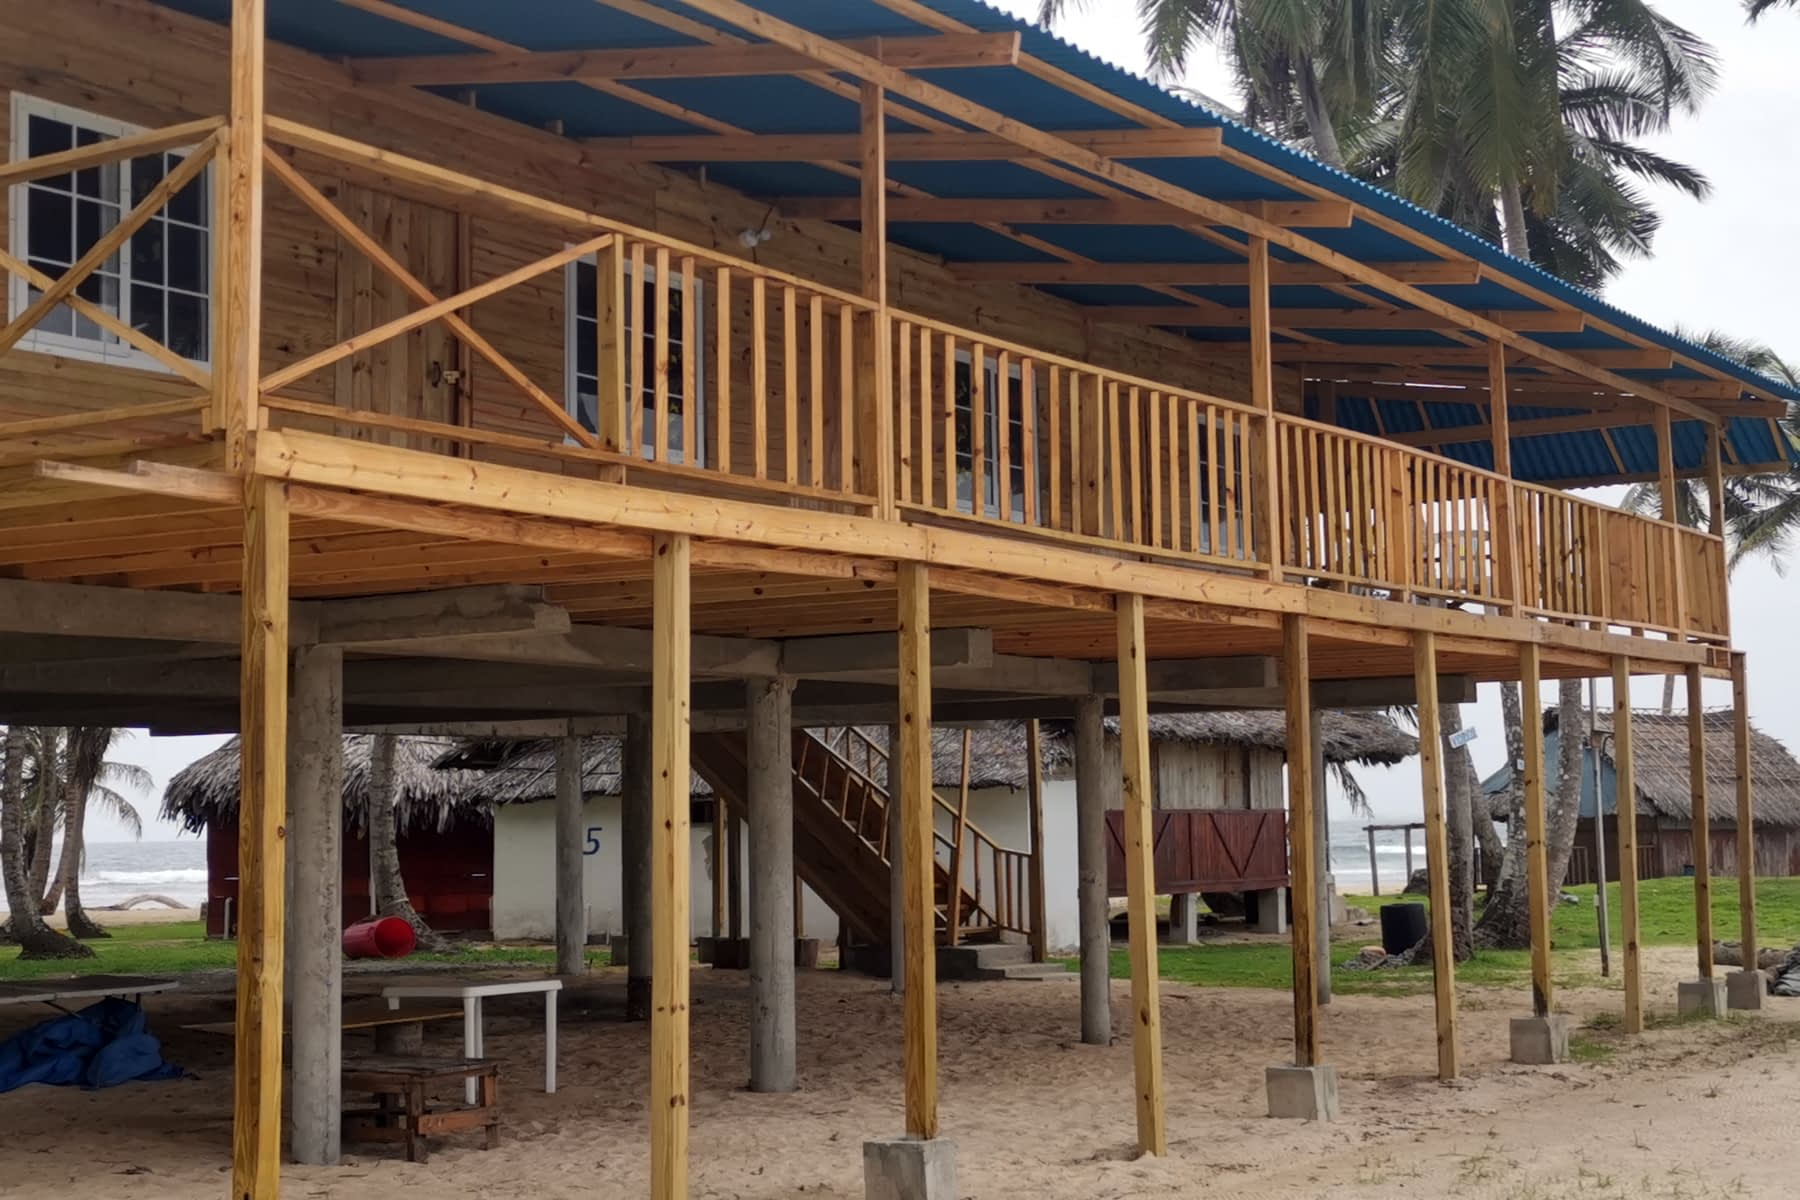 Habitaciones en la isla Iggodub